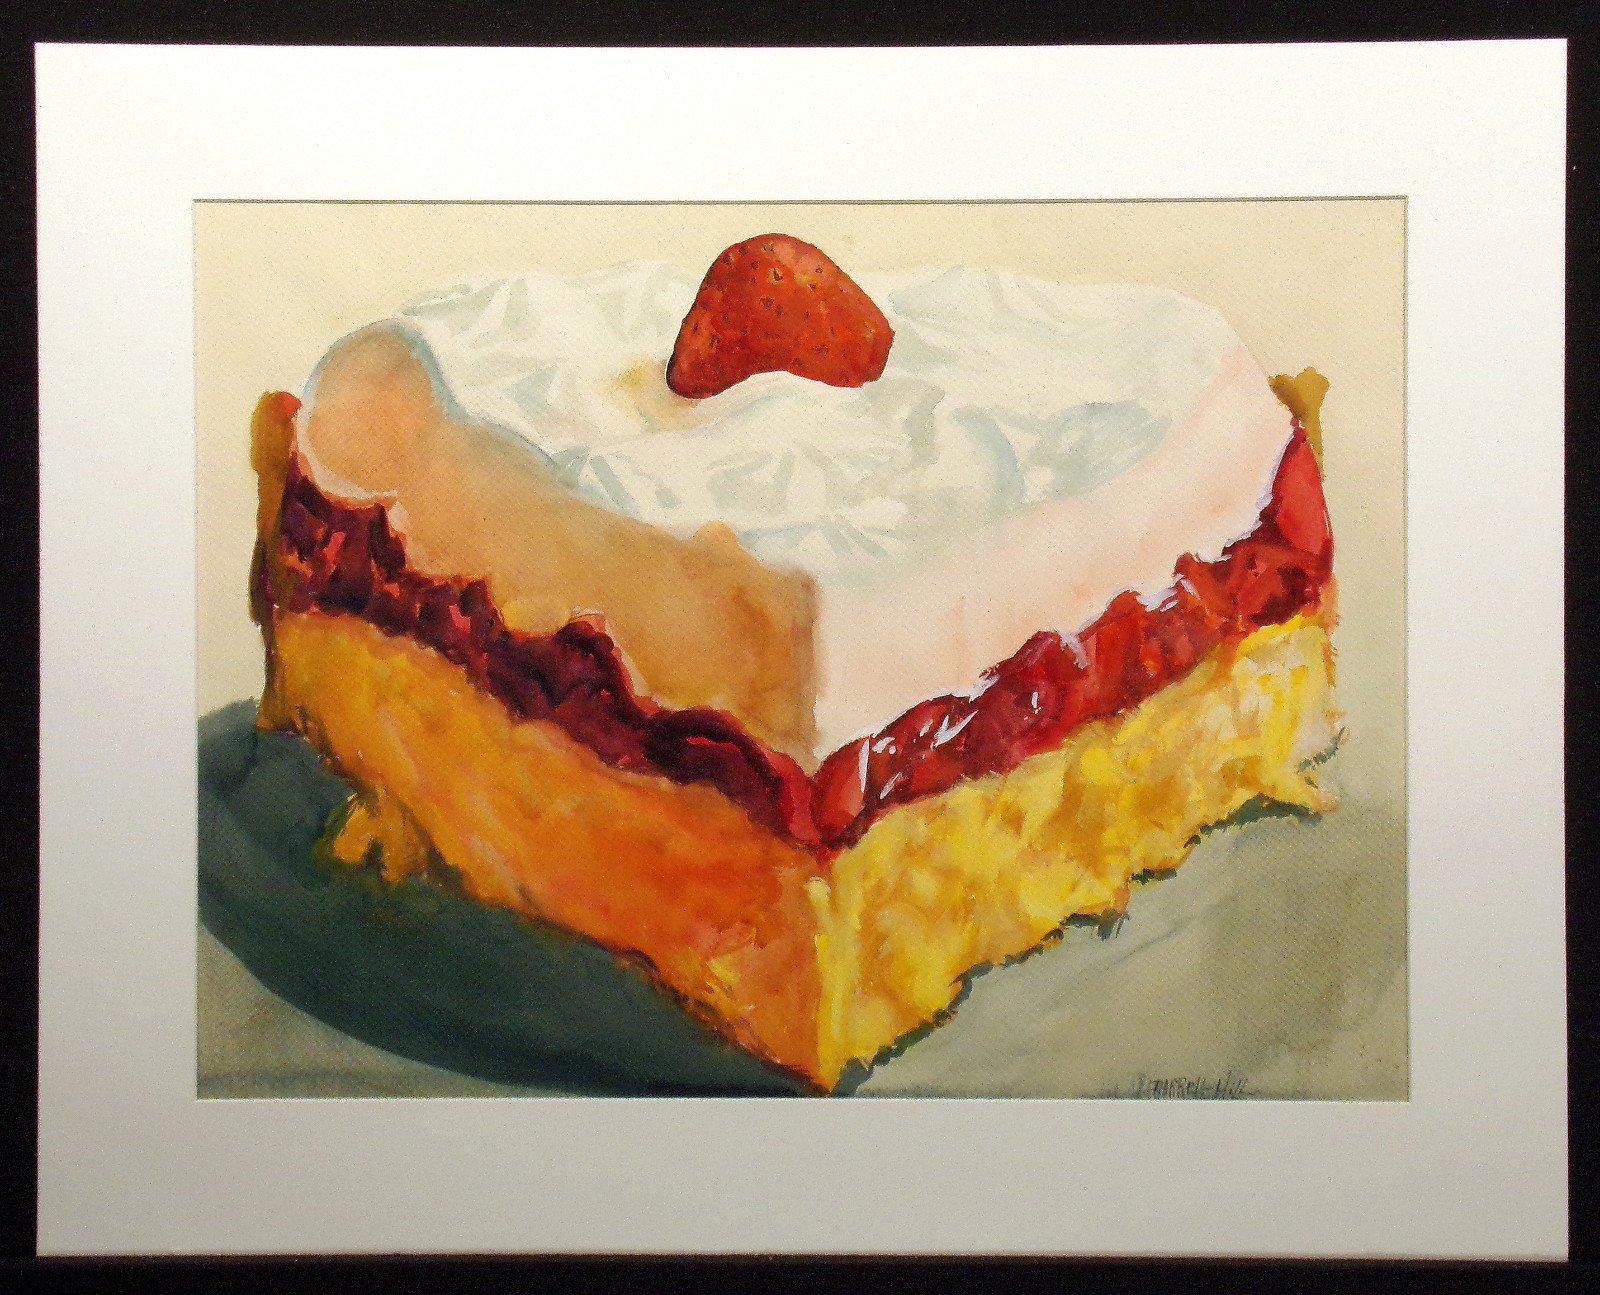 Frozen Strawberry Shortcake by